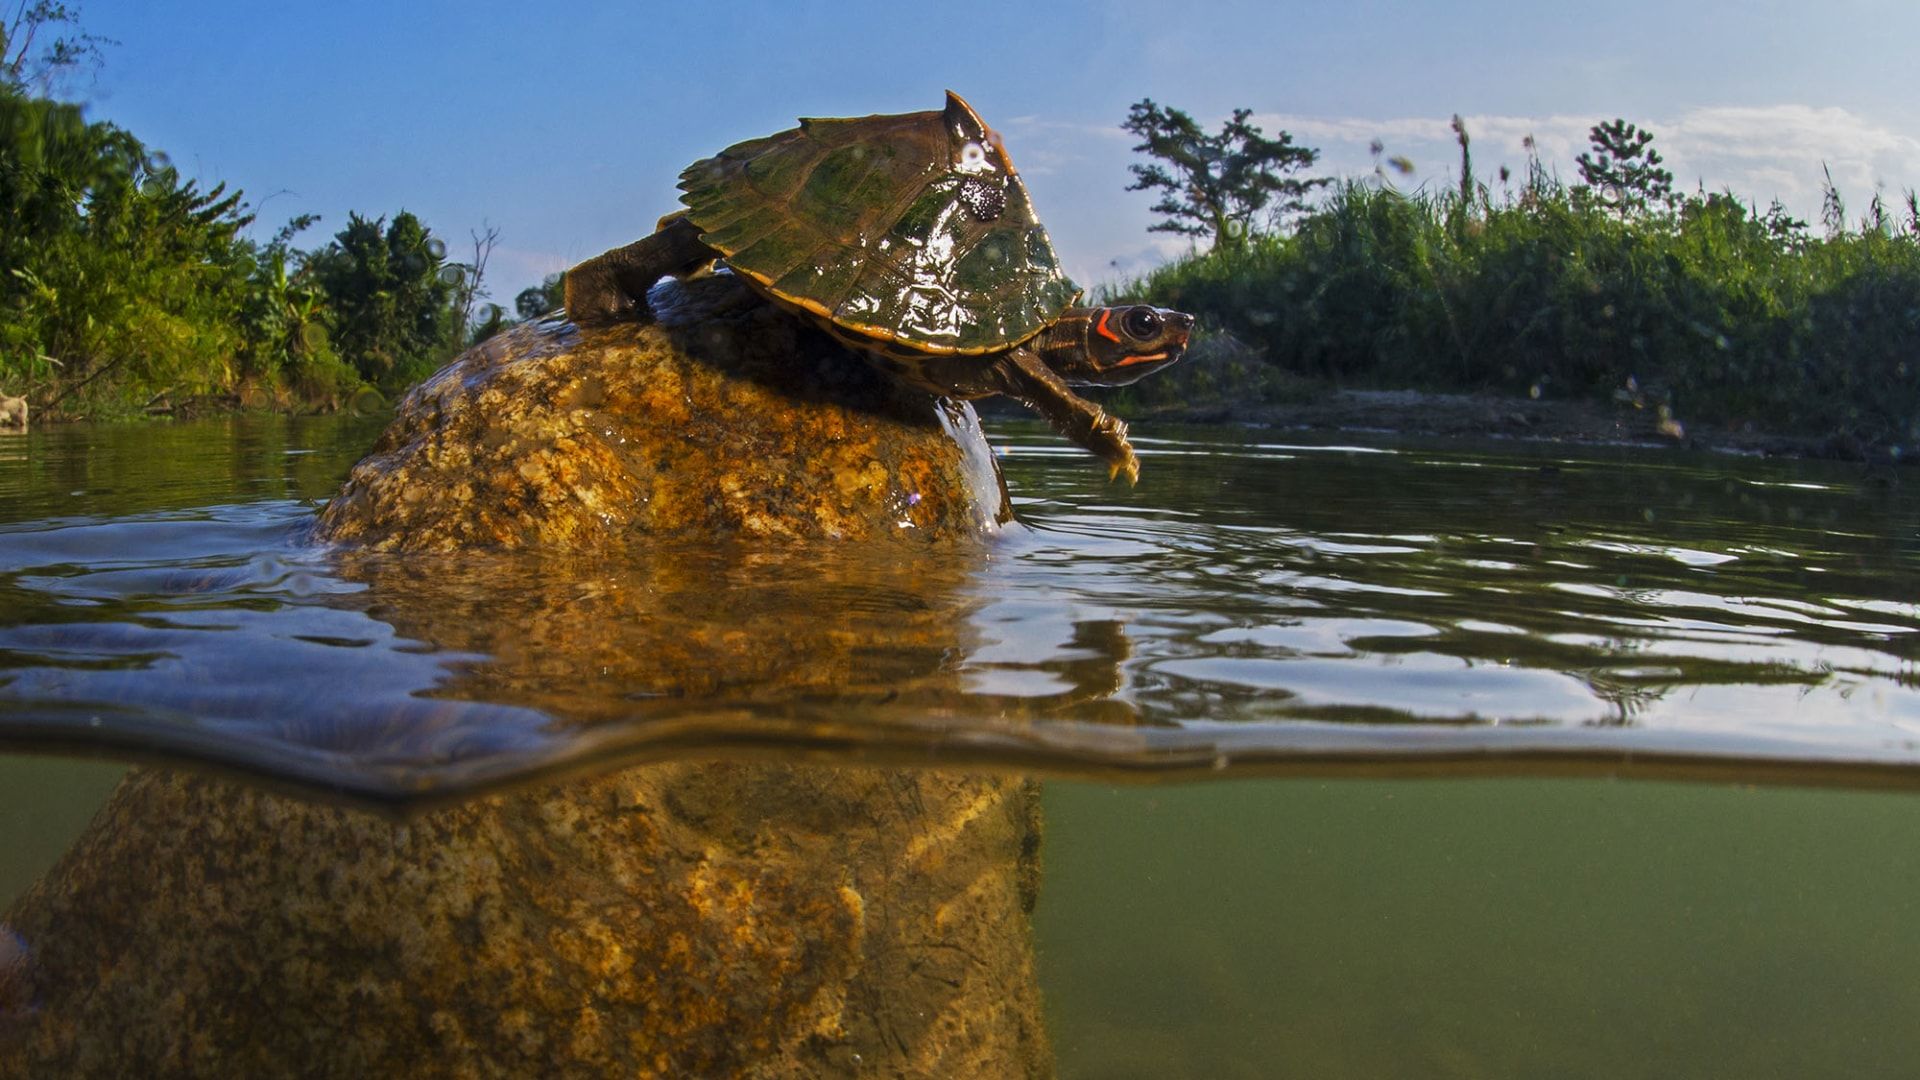 Turtle Trouble on the Brahmaputra